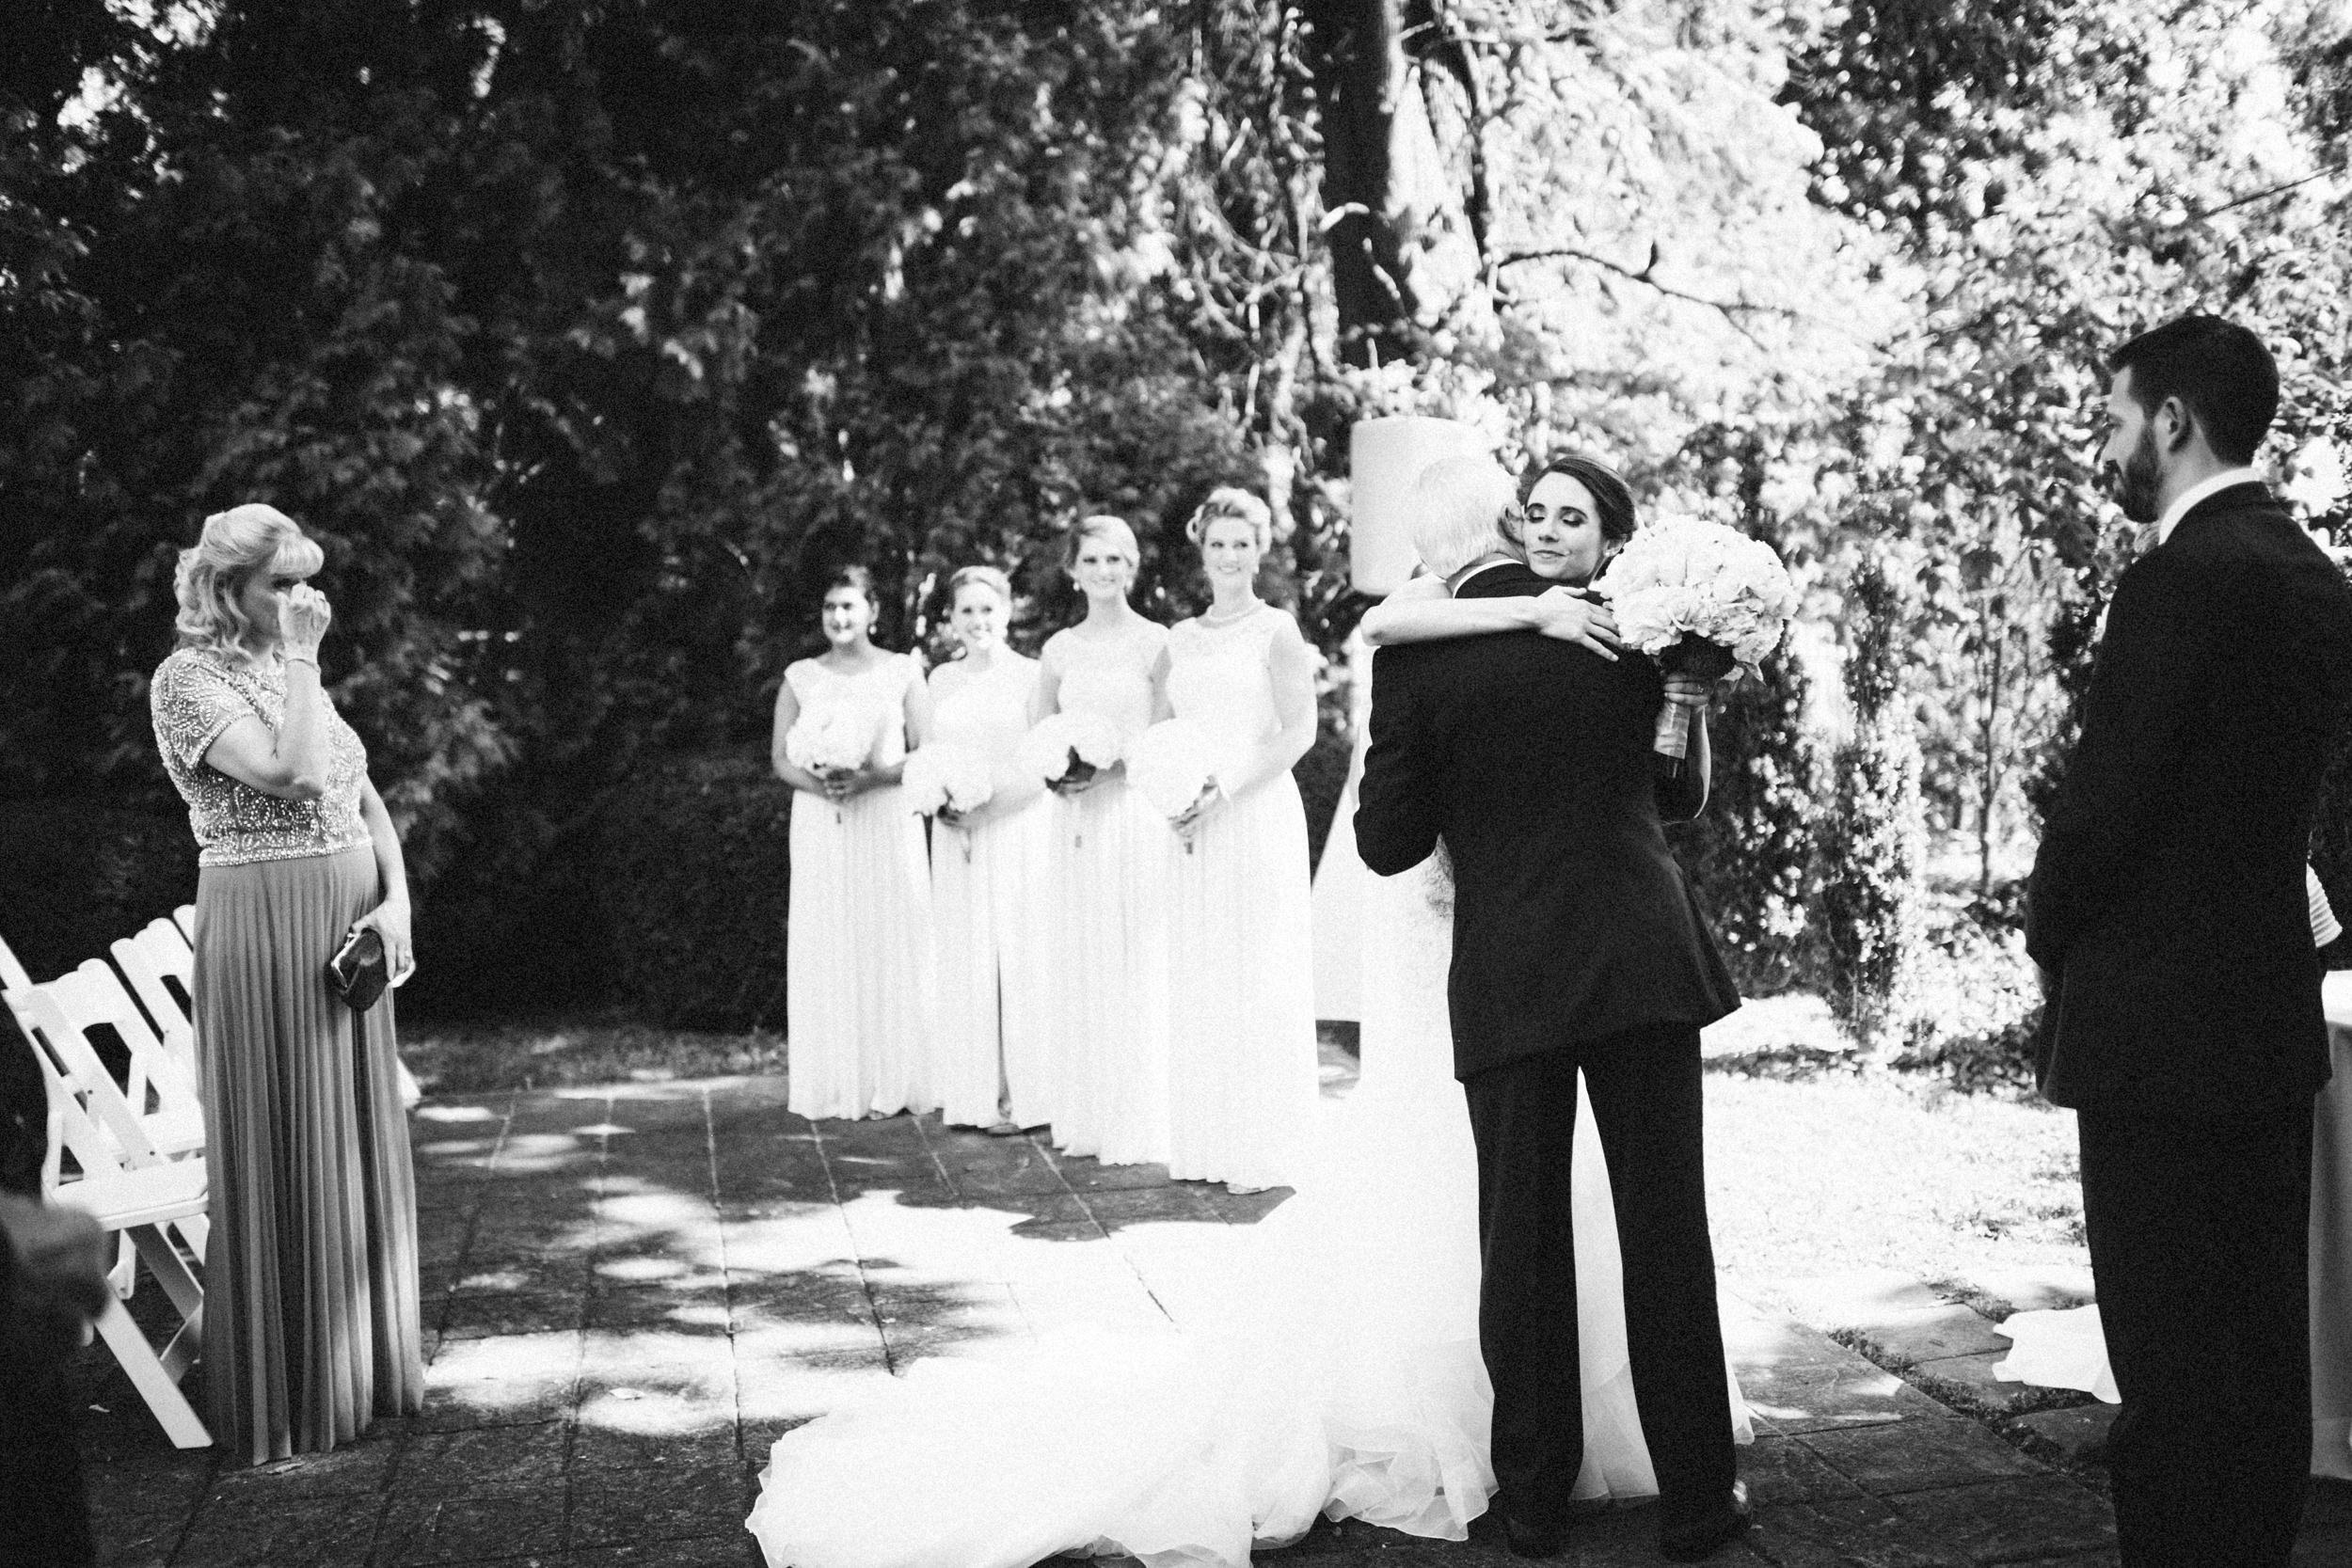 Louisville-Kentucky-Wedding-Elopement-Photographer-Sarah-Katherine-Davis-Photography-Whitehall-Classic-Timeless-Garden-Wedding-328.jpg